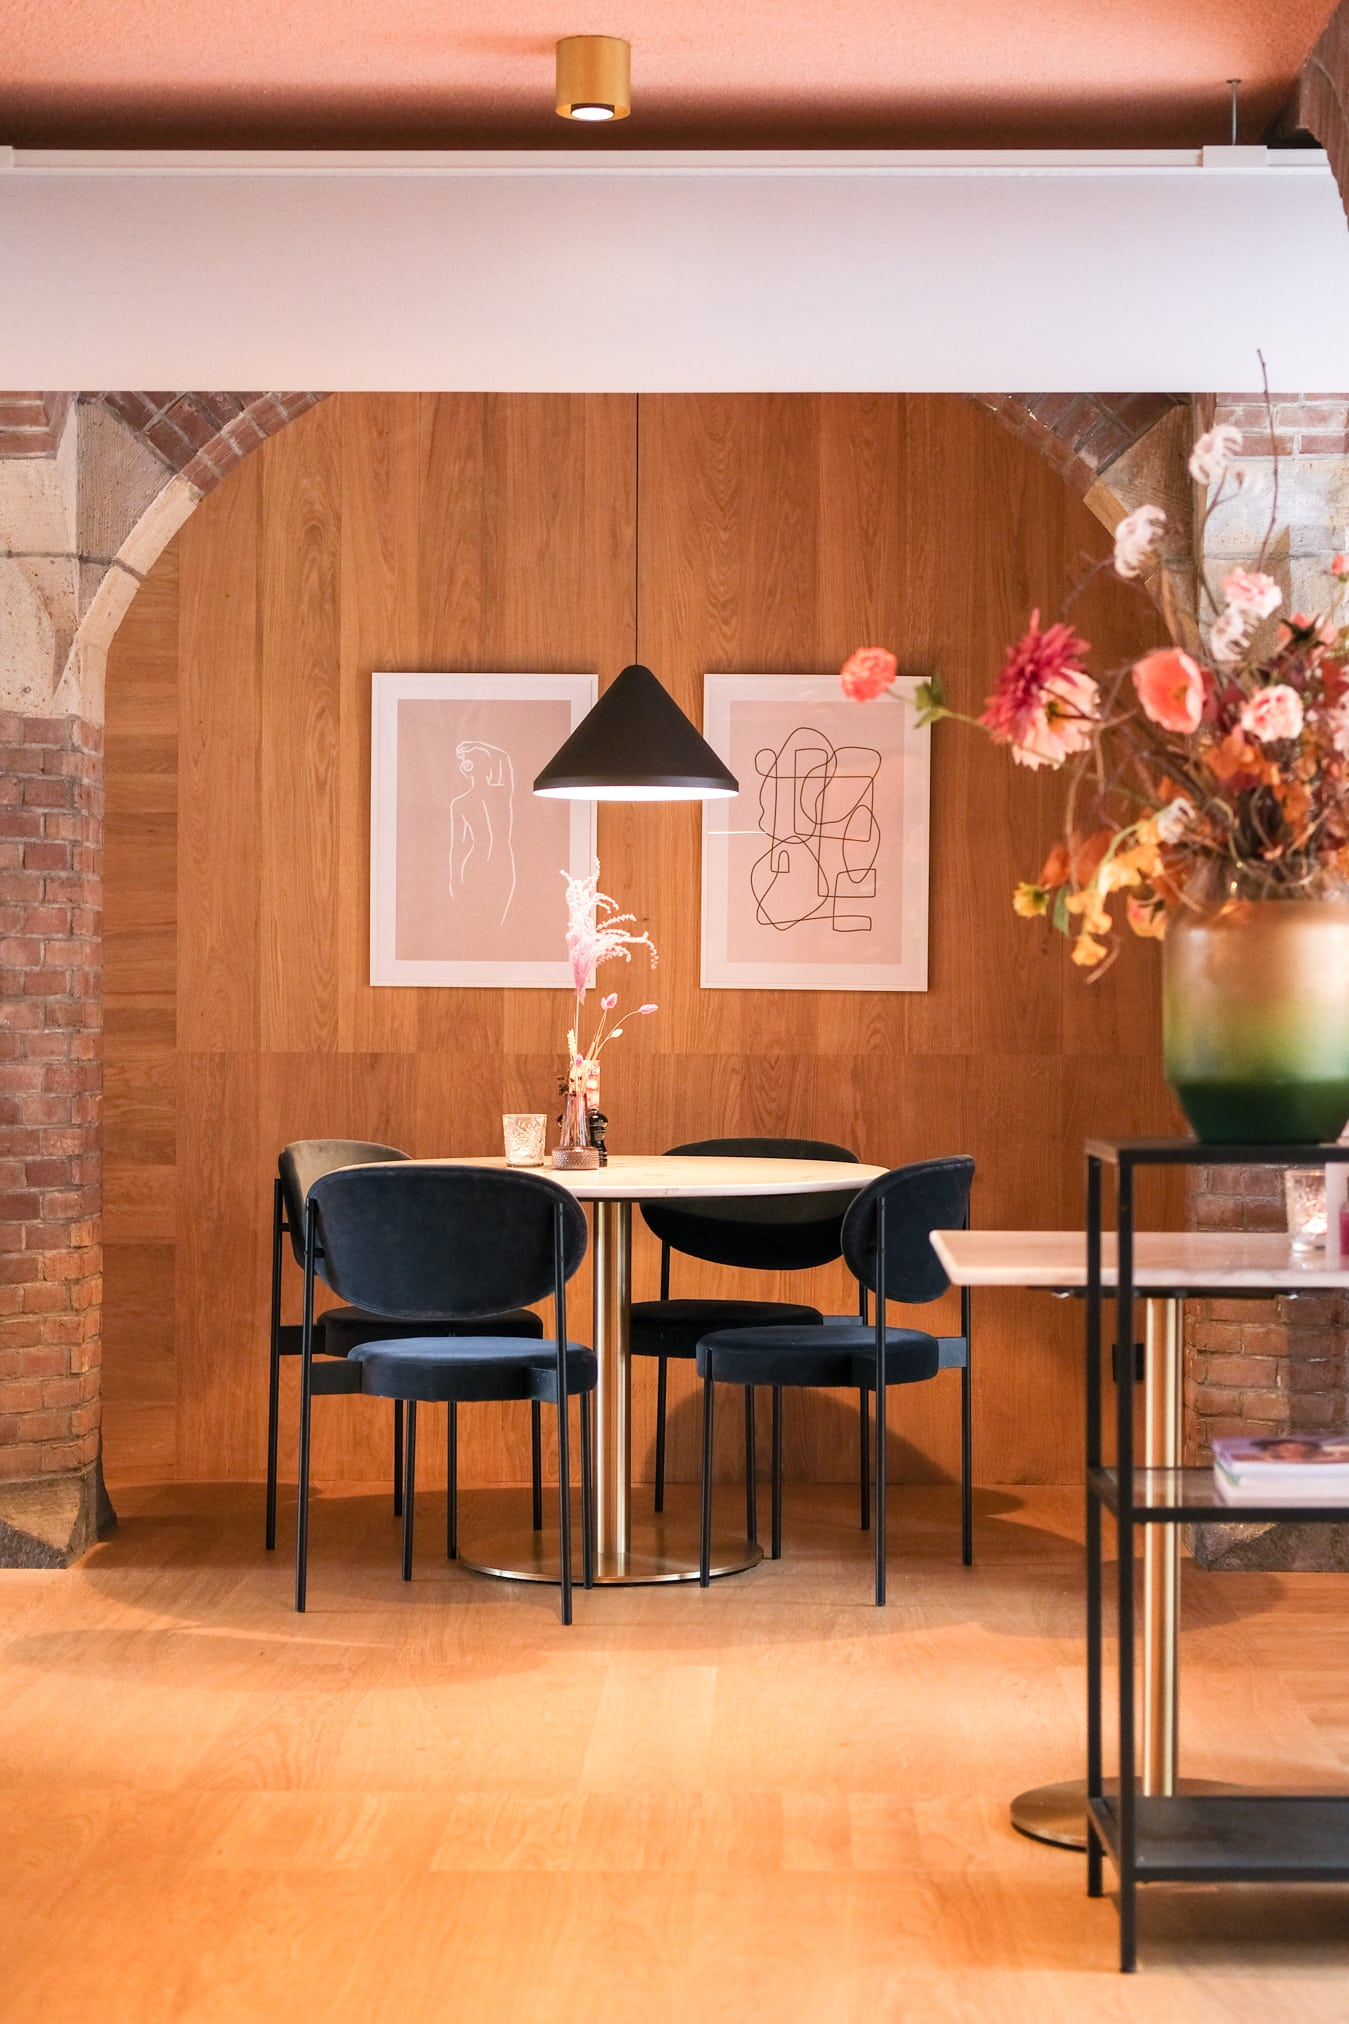 instagrammable hotels in nederland